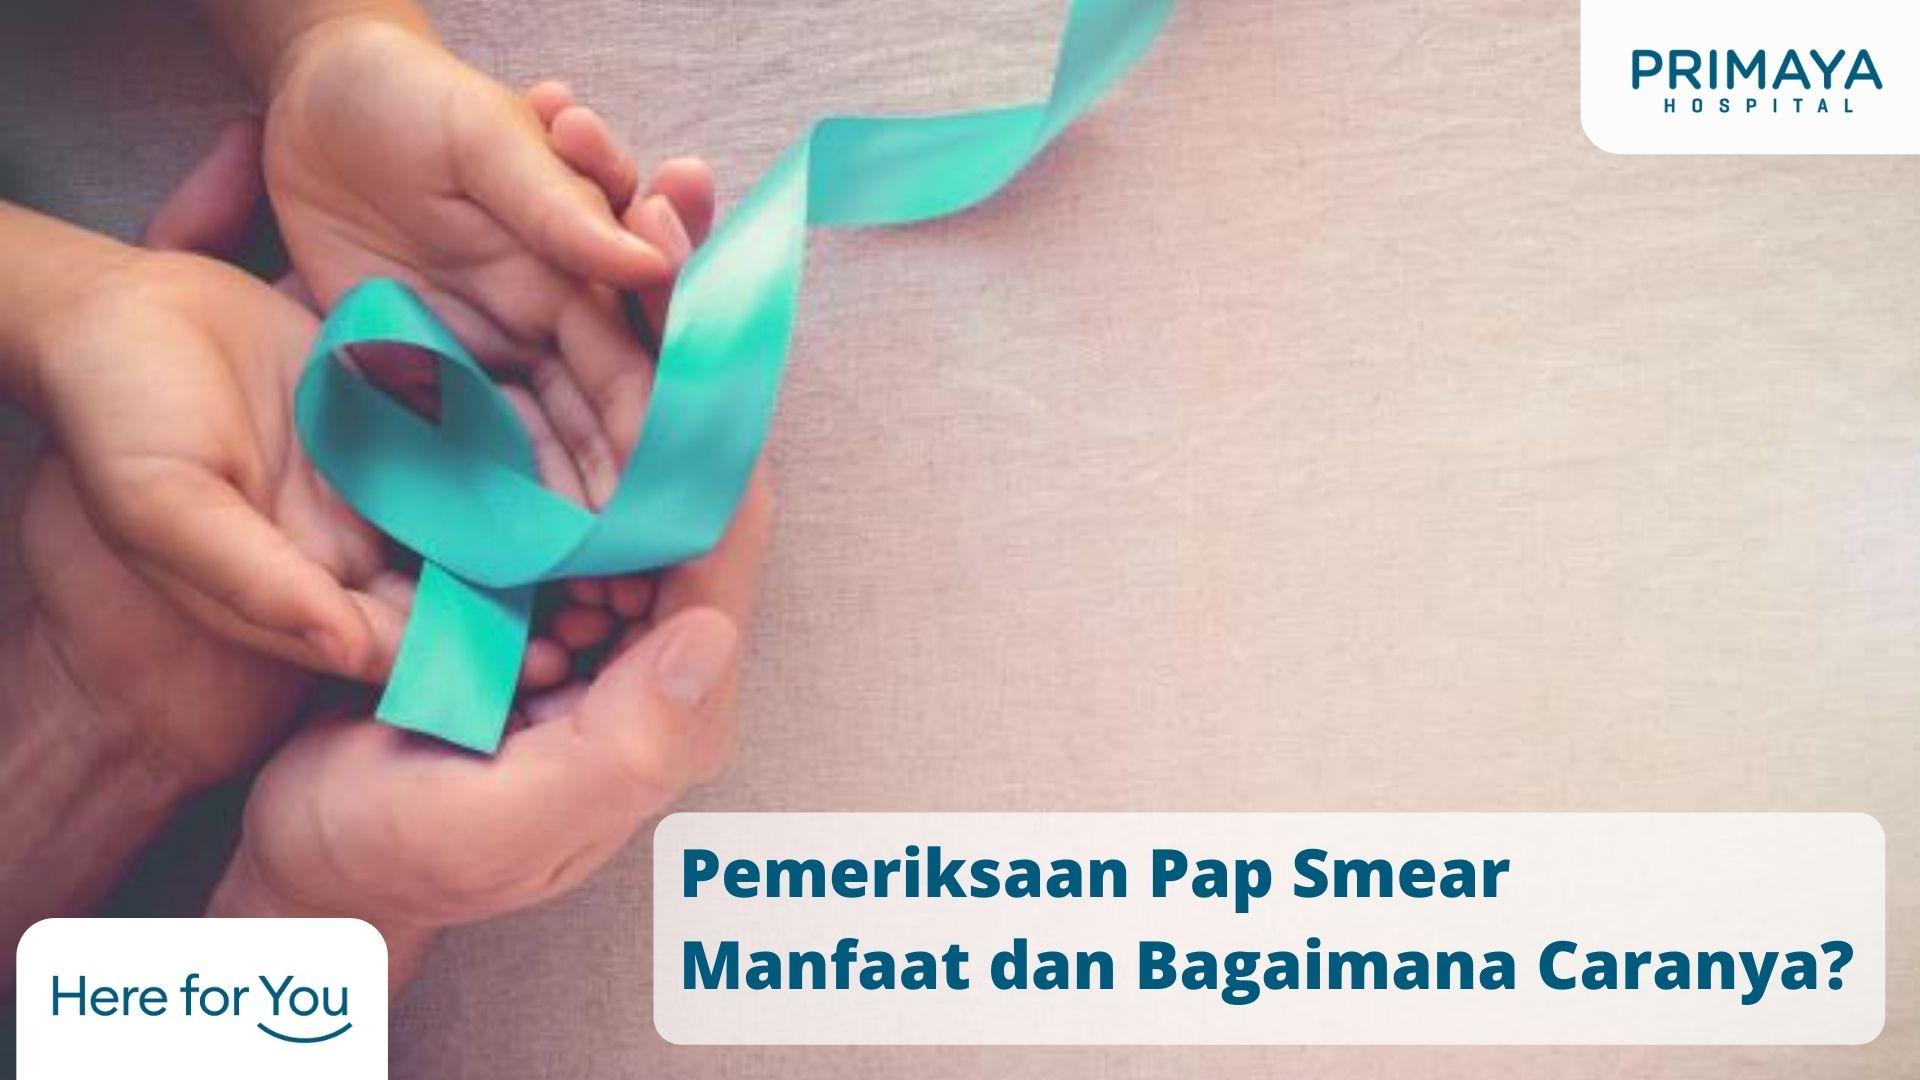 Pemeriksaan Pap Smear Manfaat dan Bagaimana Caranya_